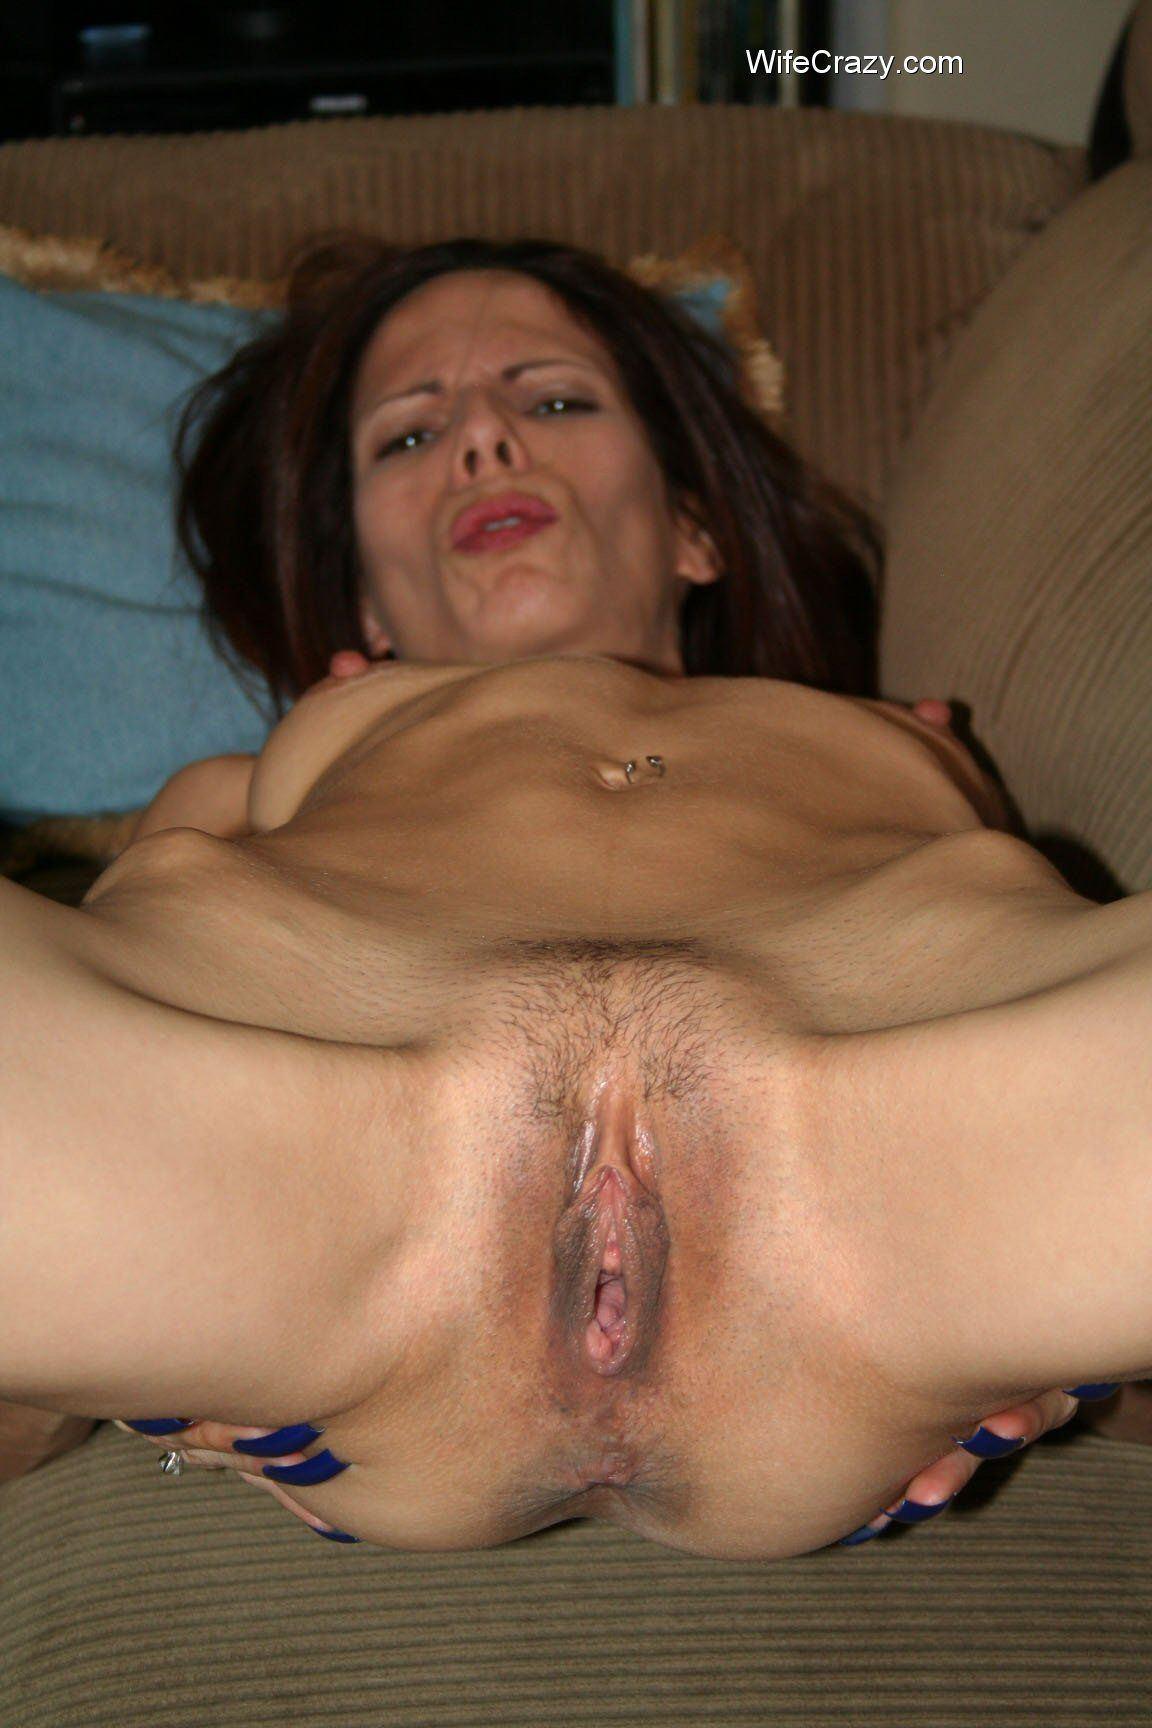 best of Porn Wife My Crazy